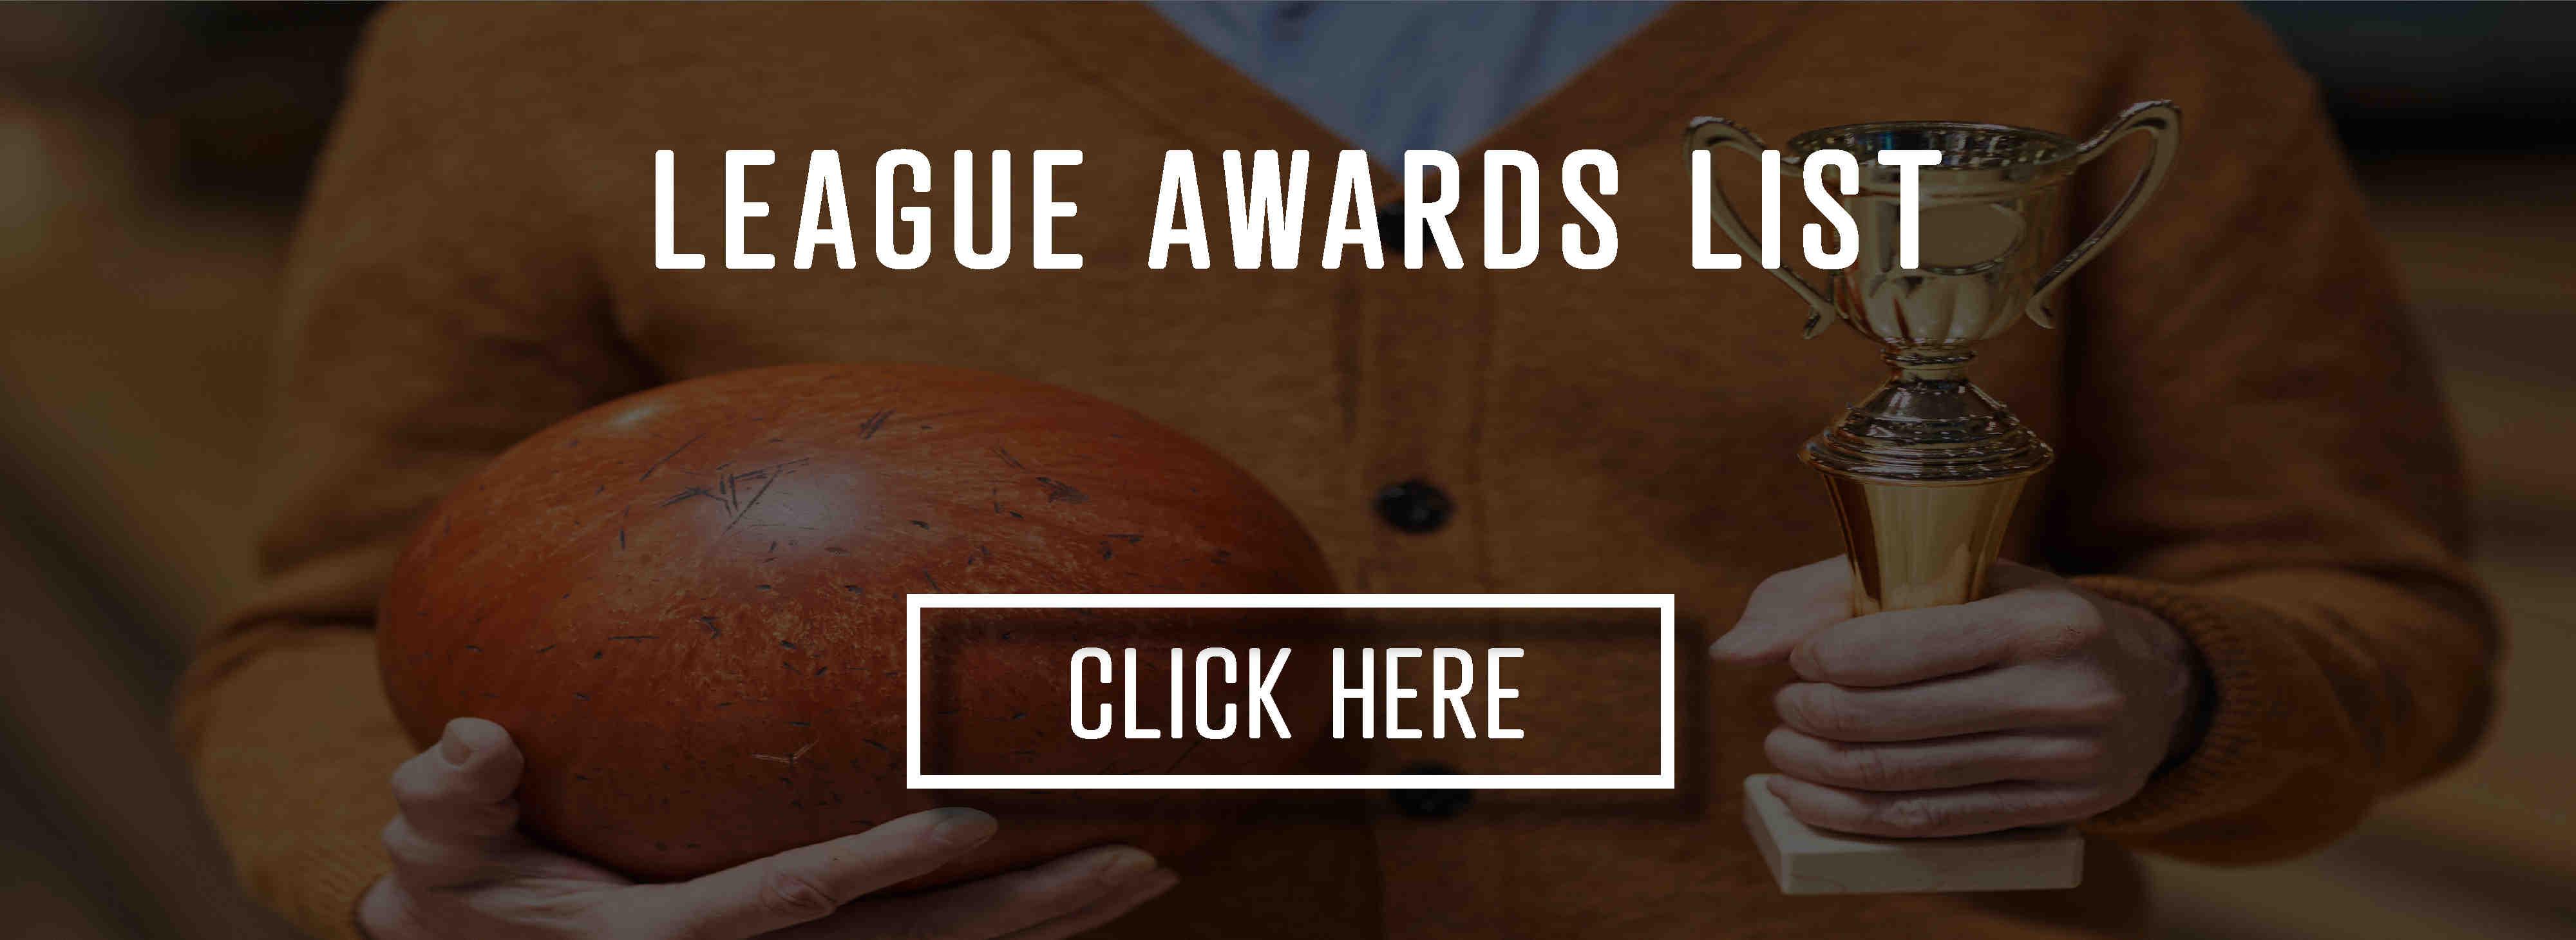 Bowling league awards list